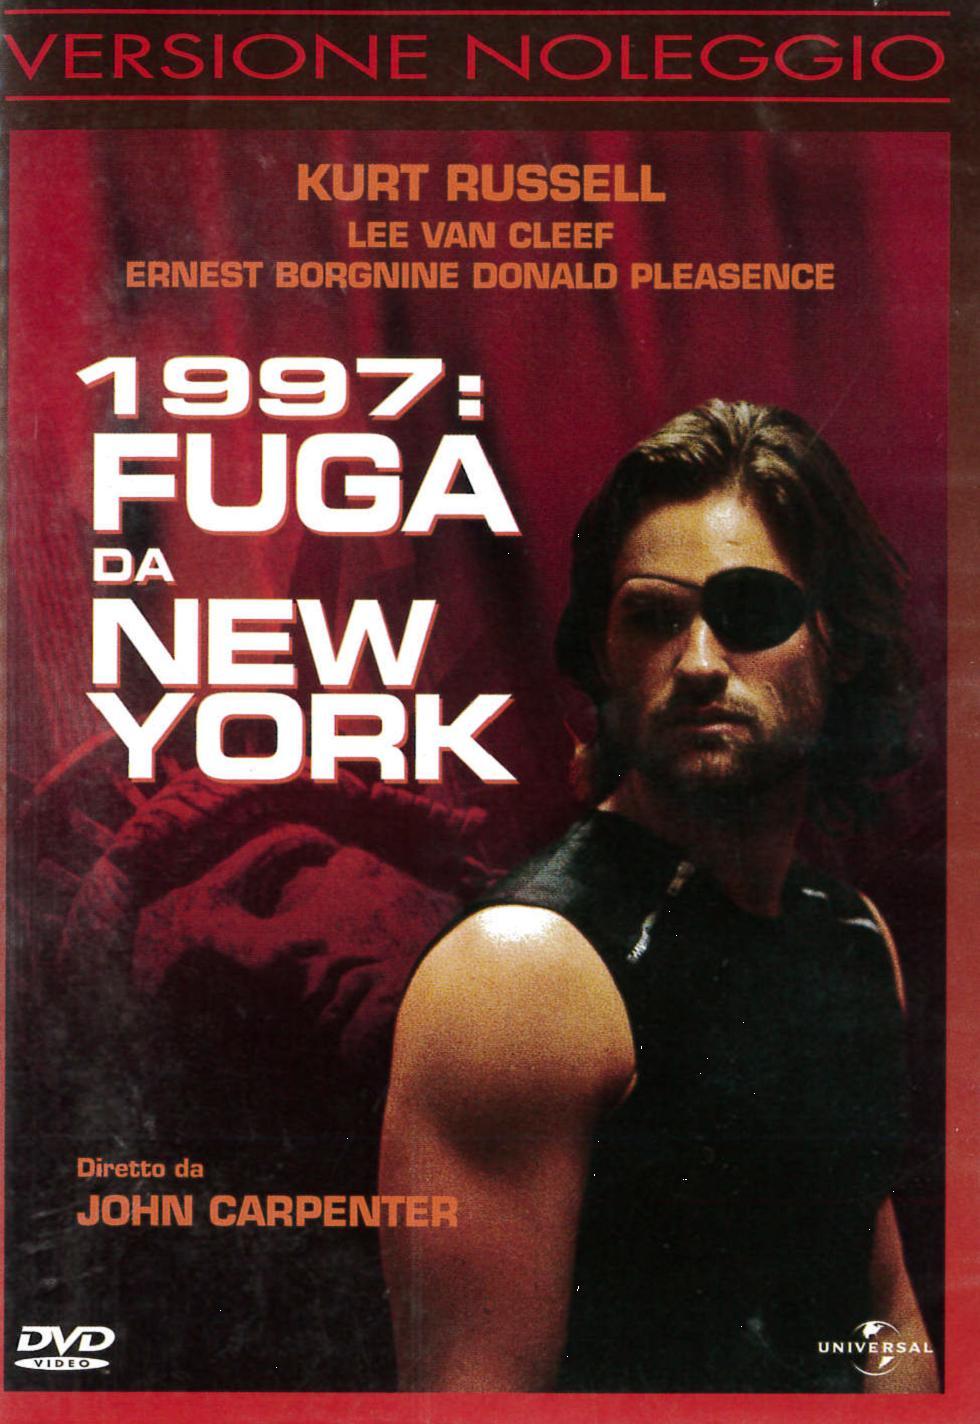 1997 FUGA DA NEW YORK - EX NOLEGGIO (DVD)